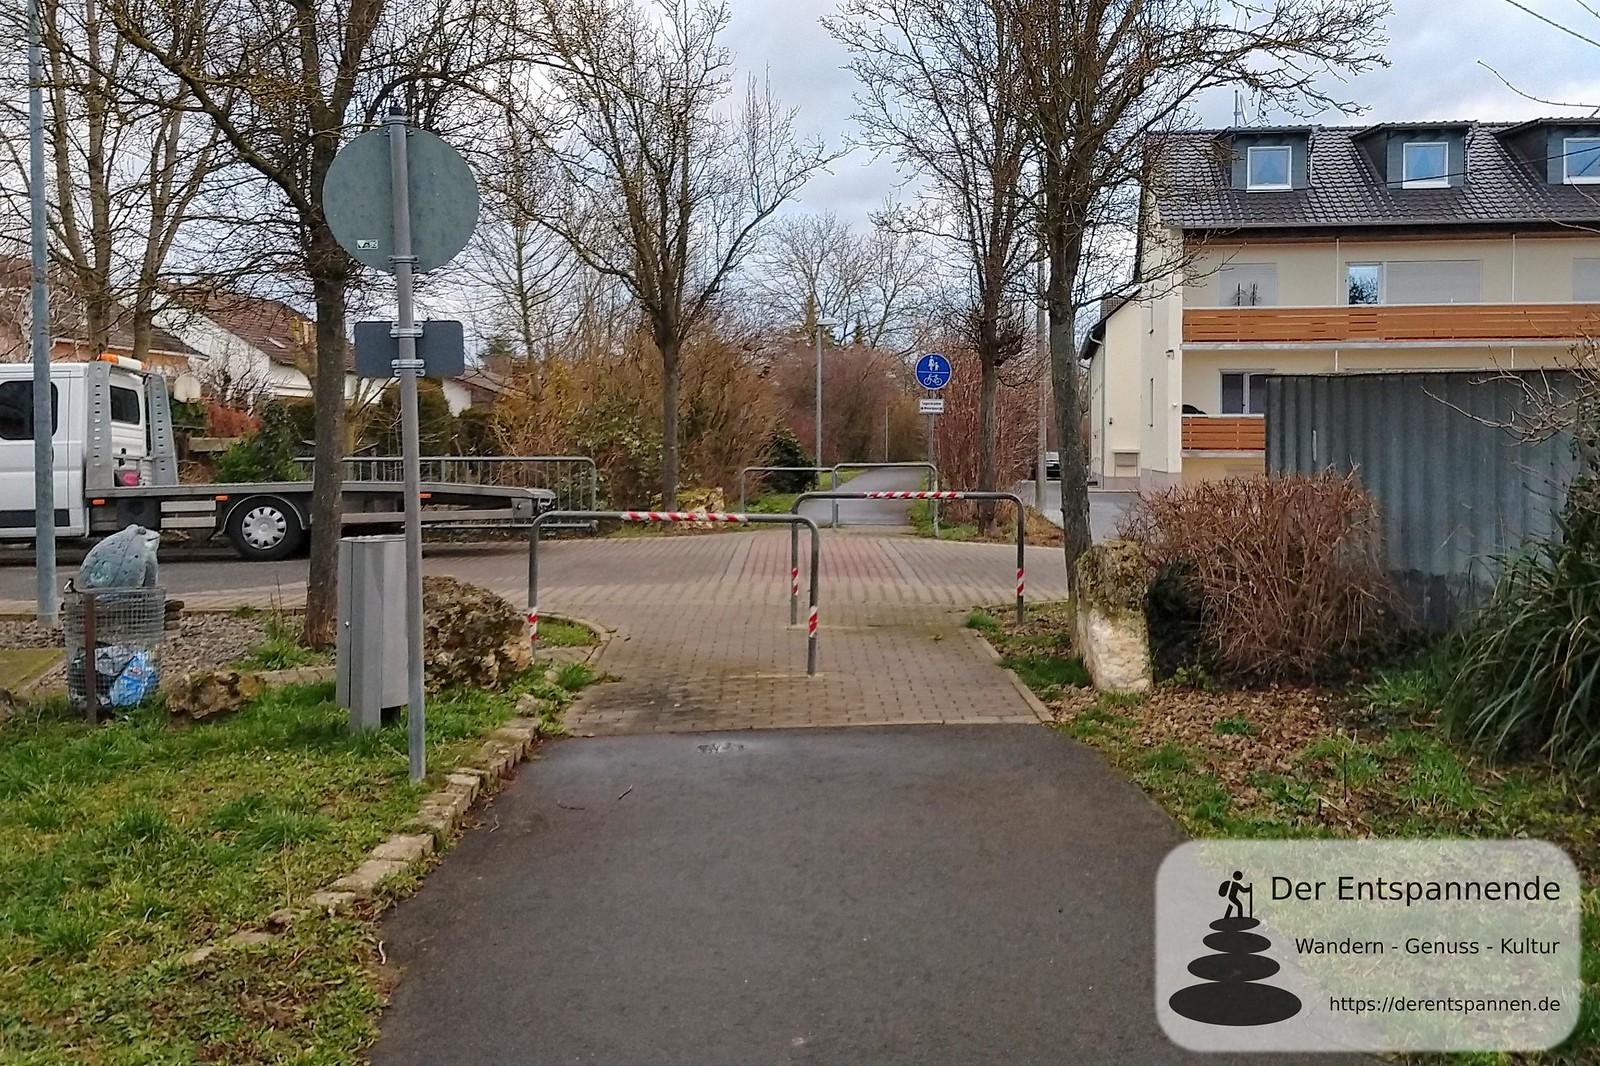 Radweg über Bergstraße in Selzen (K 37, Bahnhofstr.), ehemalige Bahnstrecke Alzey-Bodenheim (Amiche)